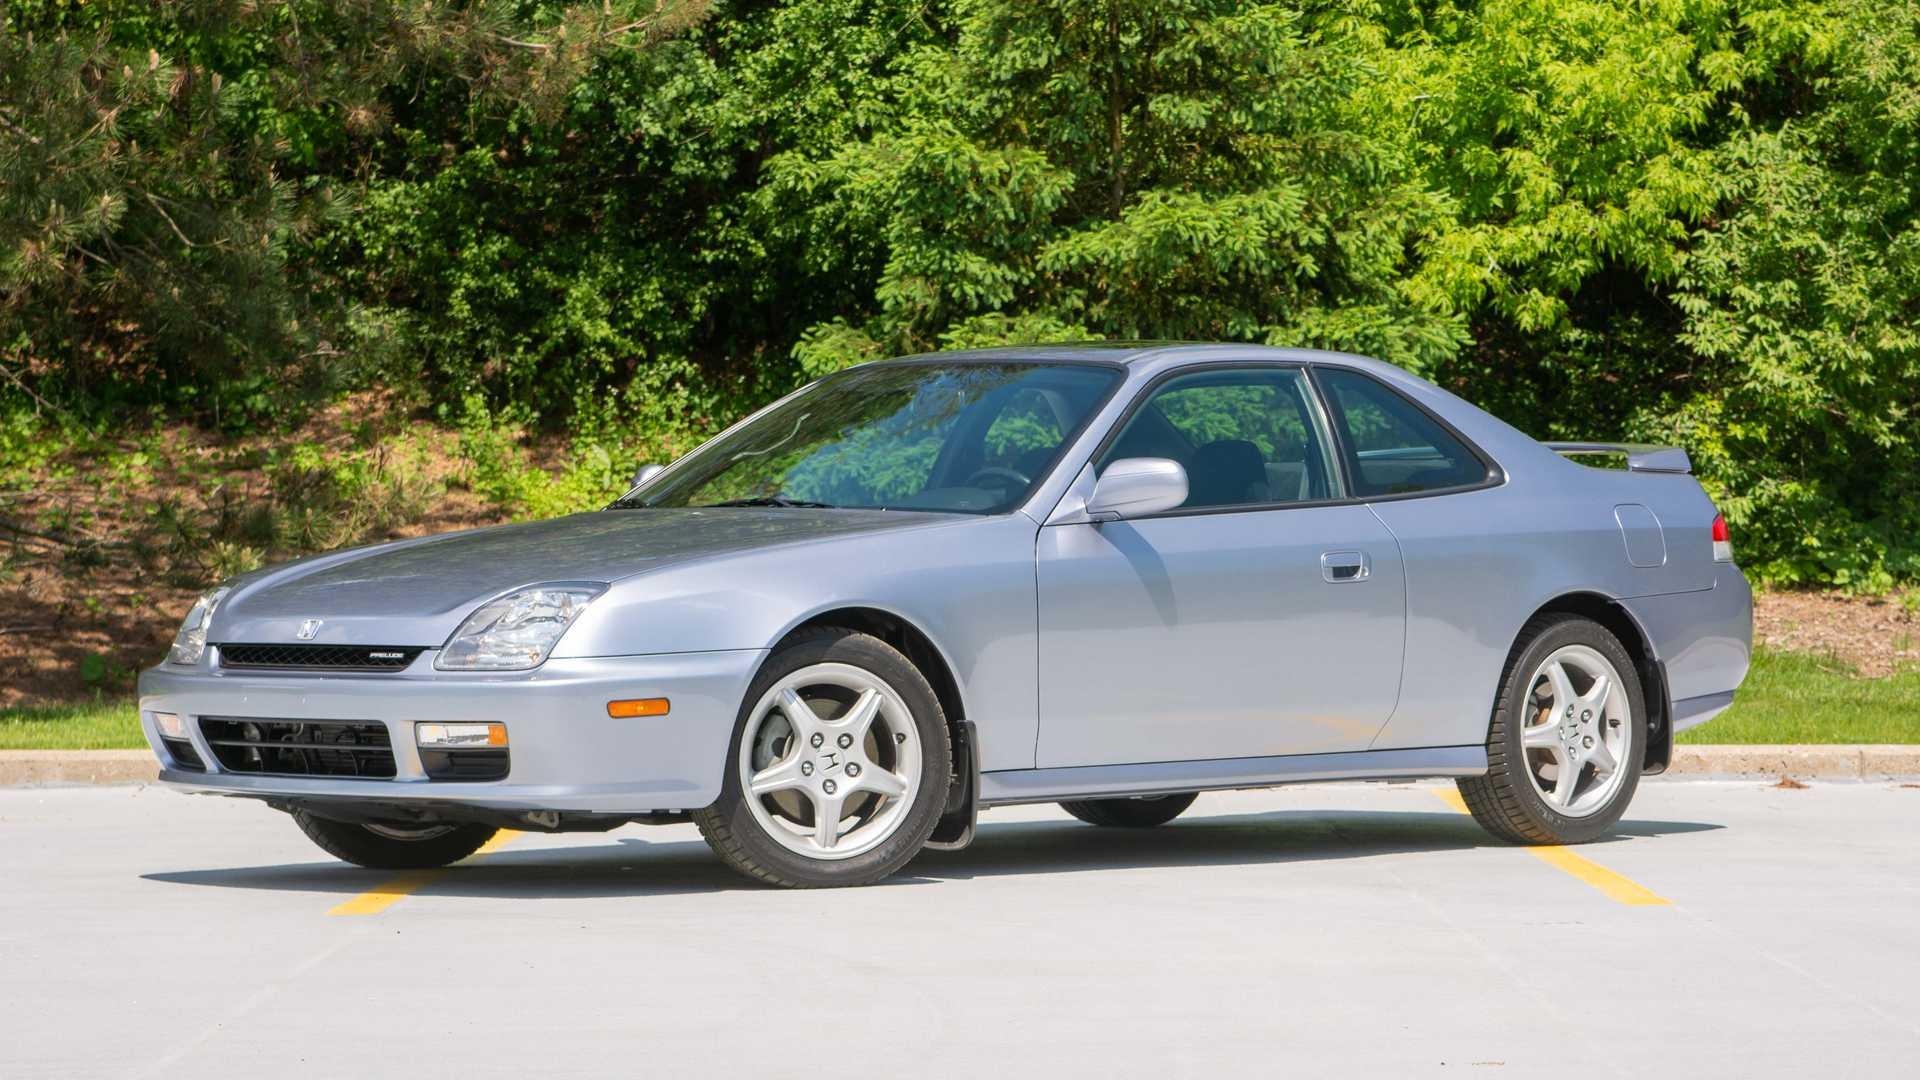 Grey Honda Prelude